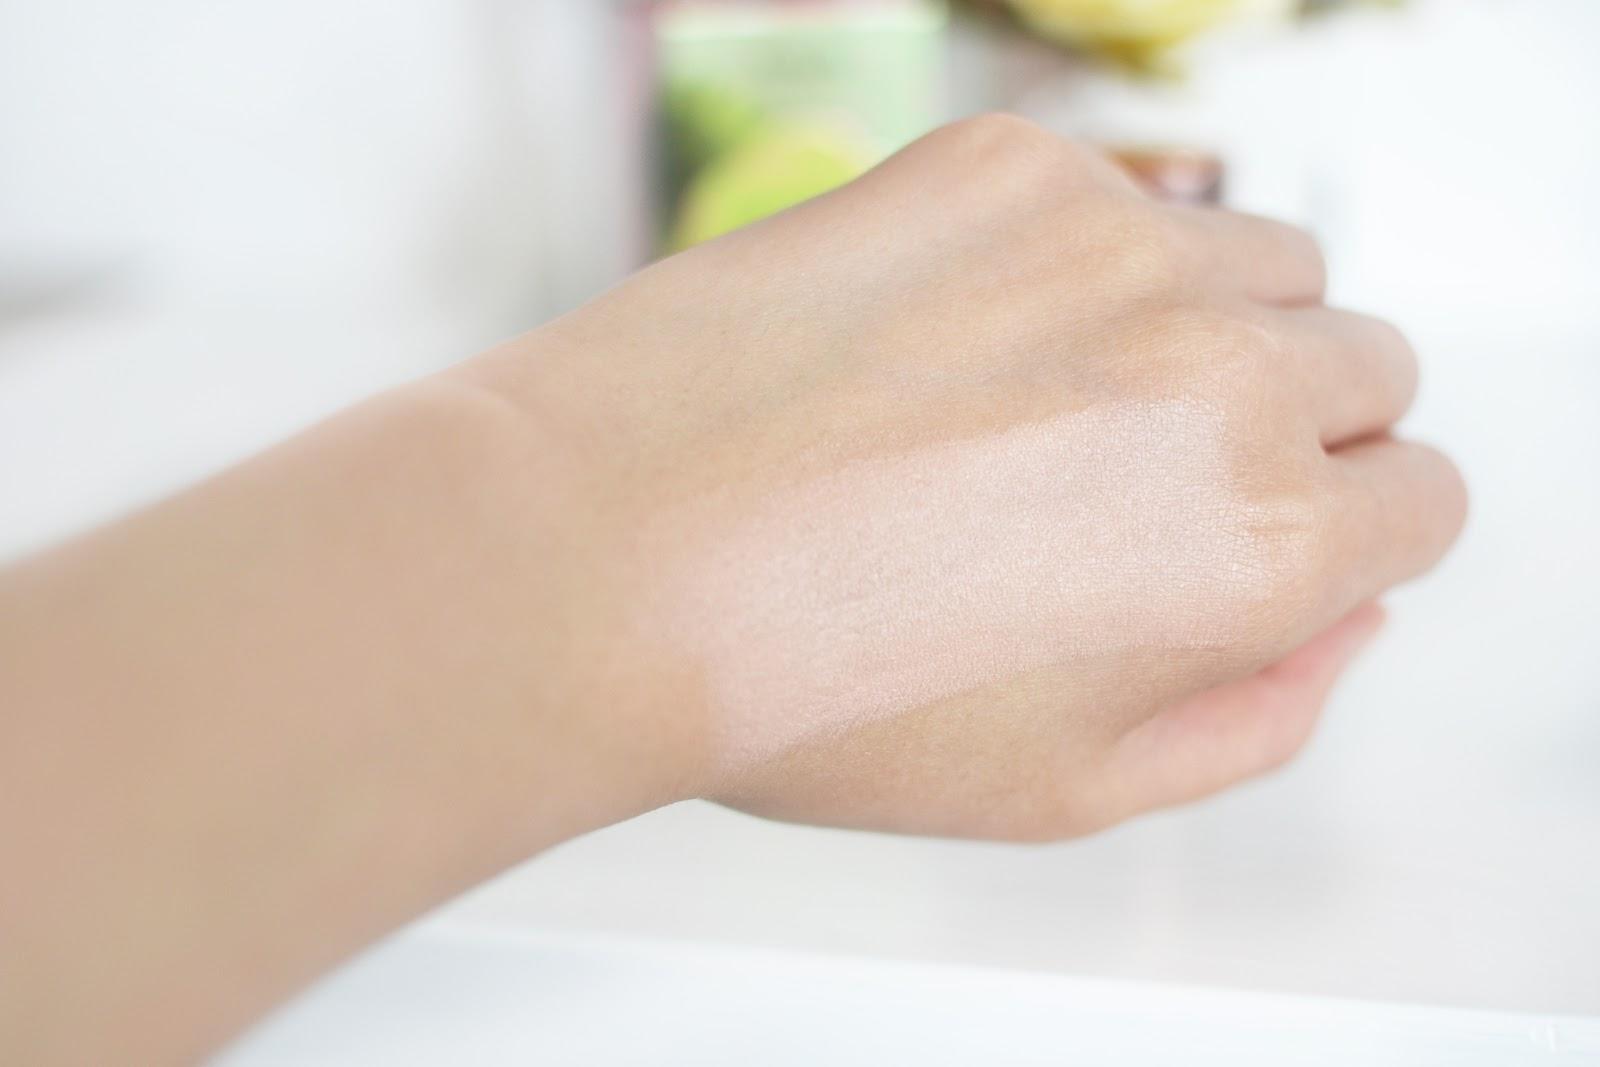 Benefit's Dandelion Shy Beam swatch